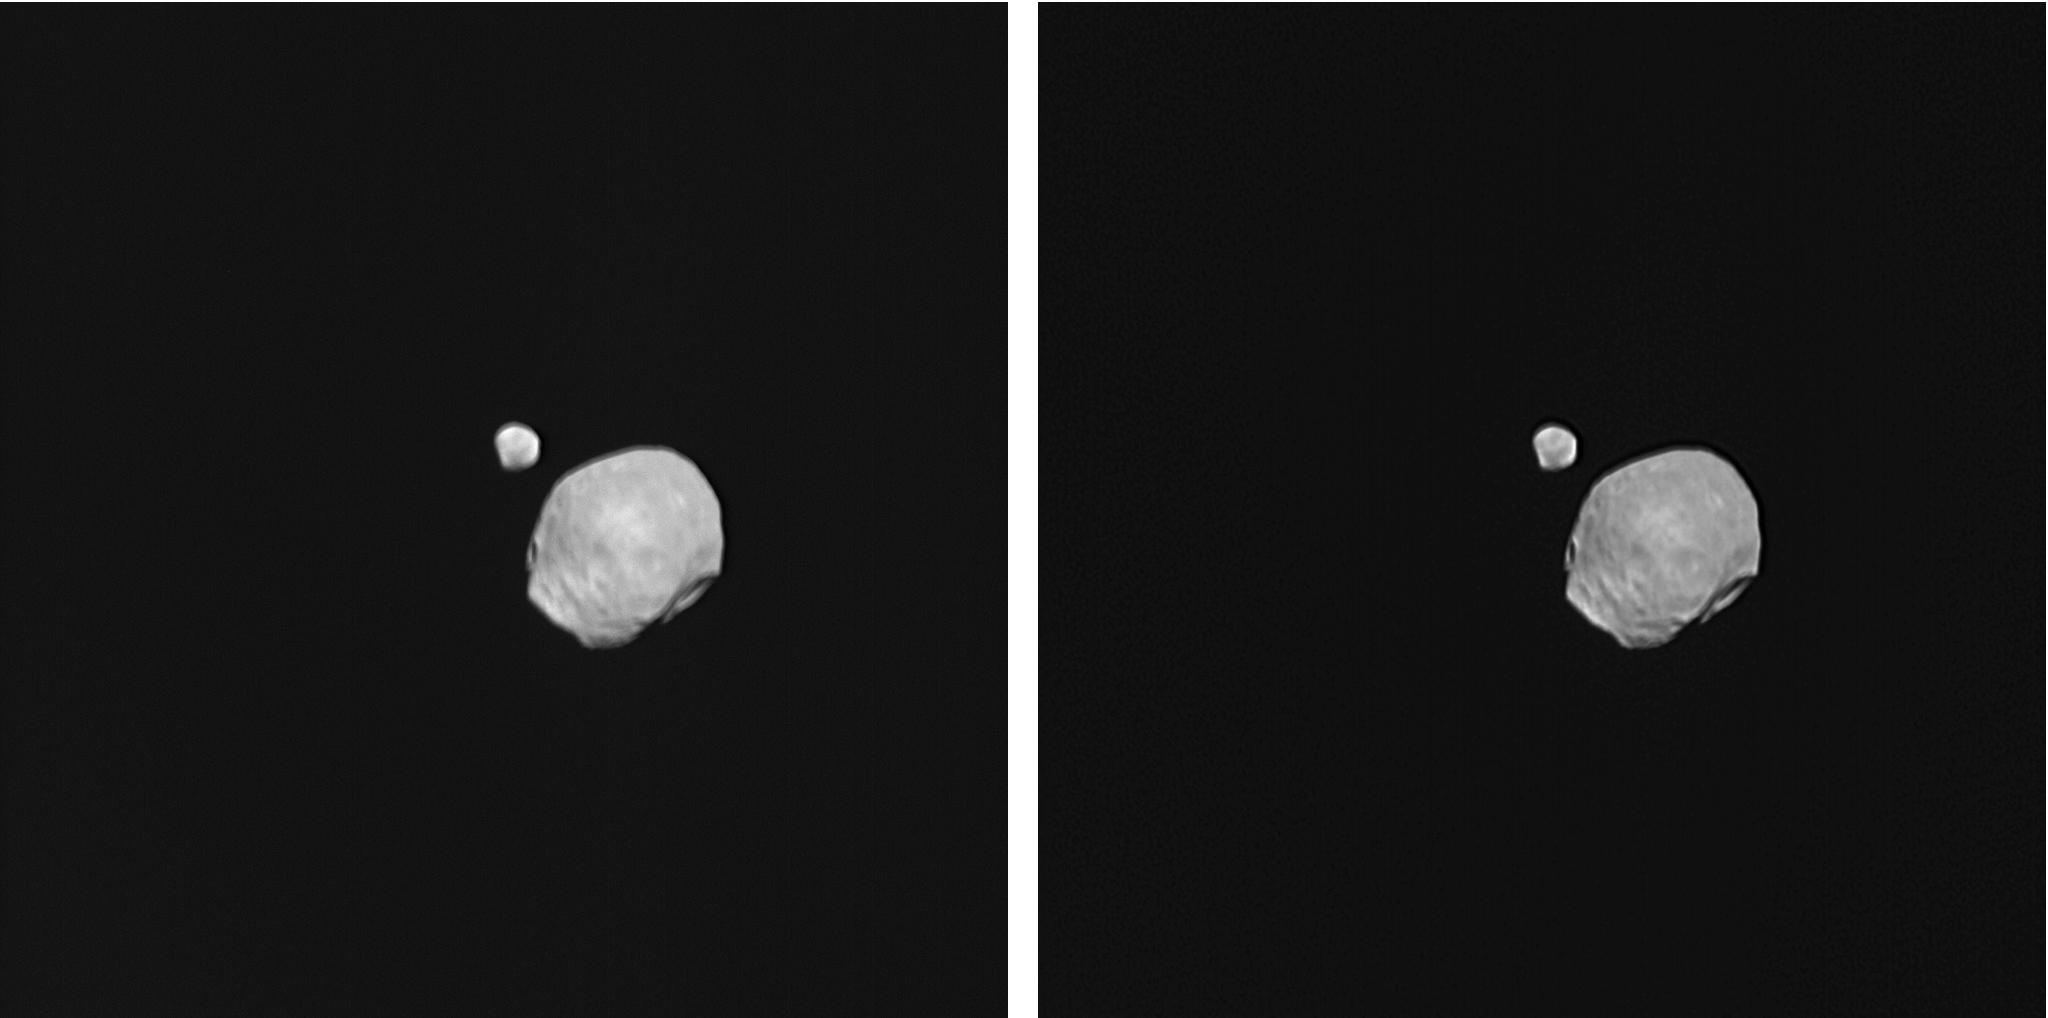 1567216721653-455-20091201-Images_of_both_moons-03-PhobosDeimos_H1.jpg